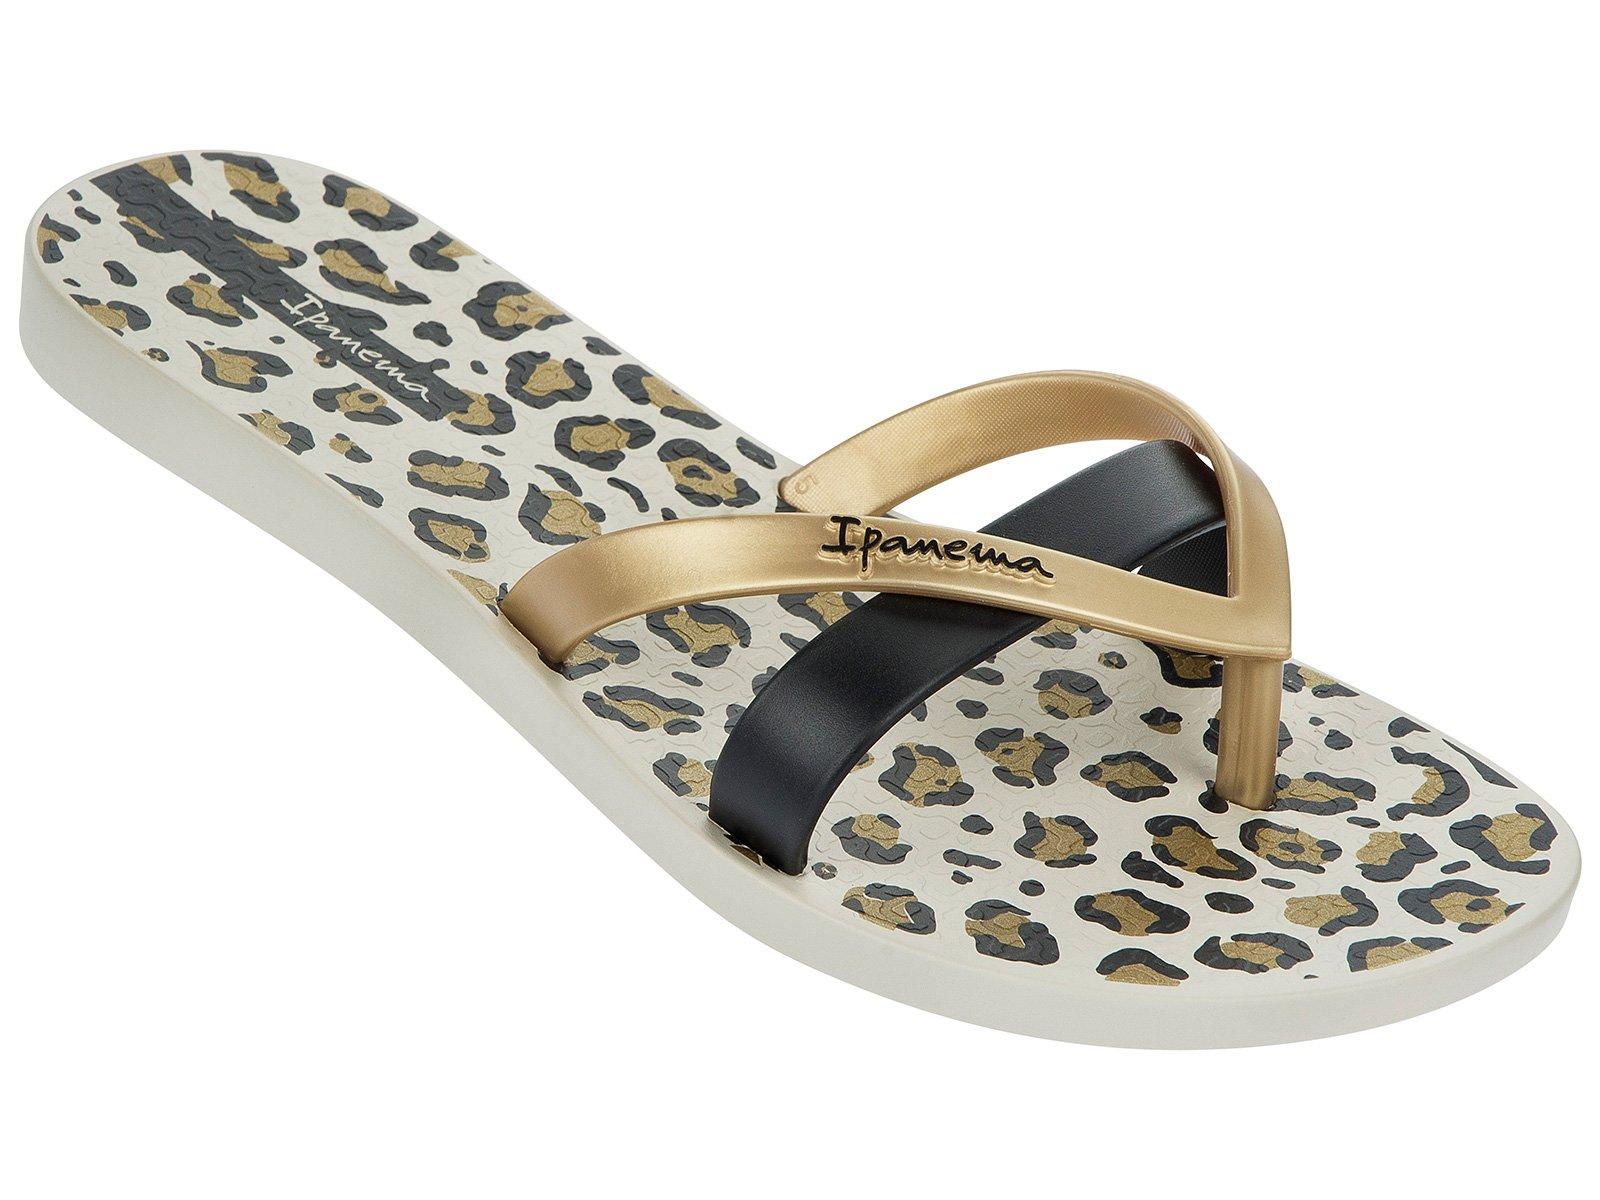 ipanema flip flops ipanema kirey silk fem beige gold black. Black Bedroom Furniture Sets. Home Design Ideas